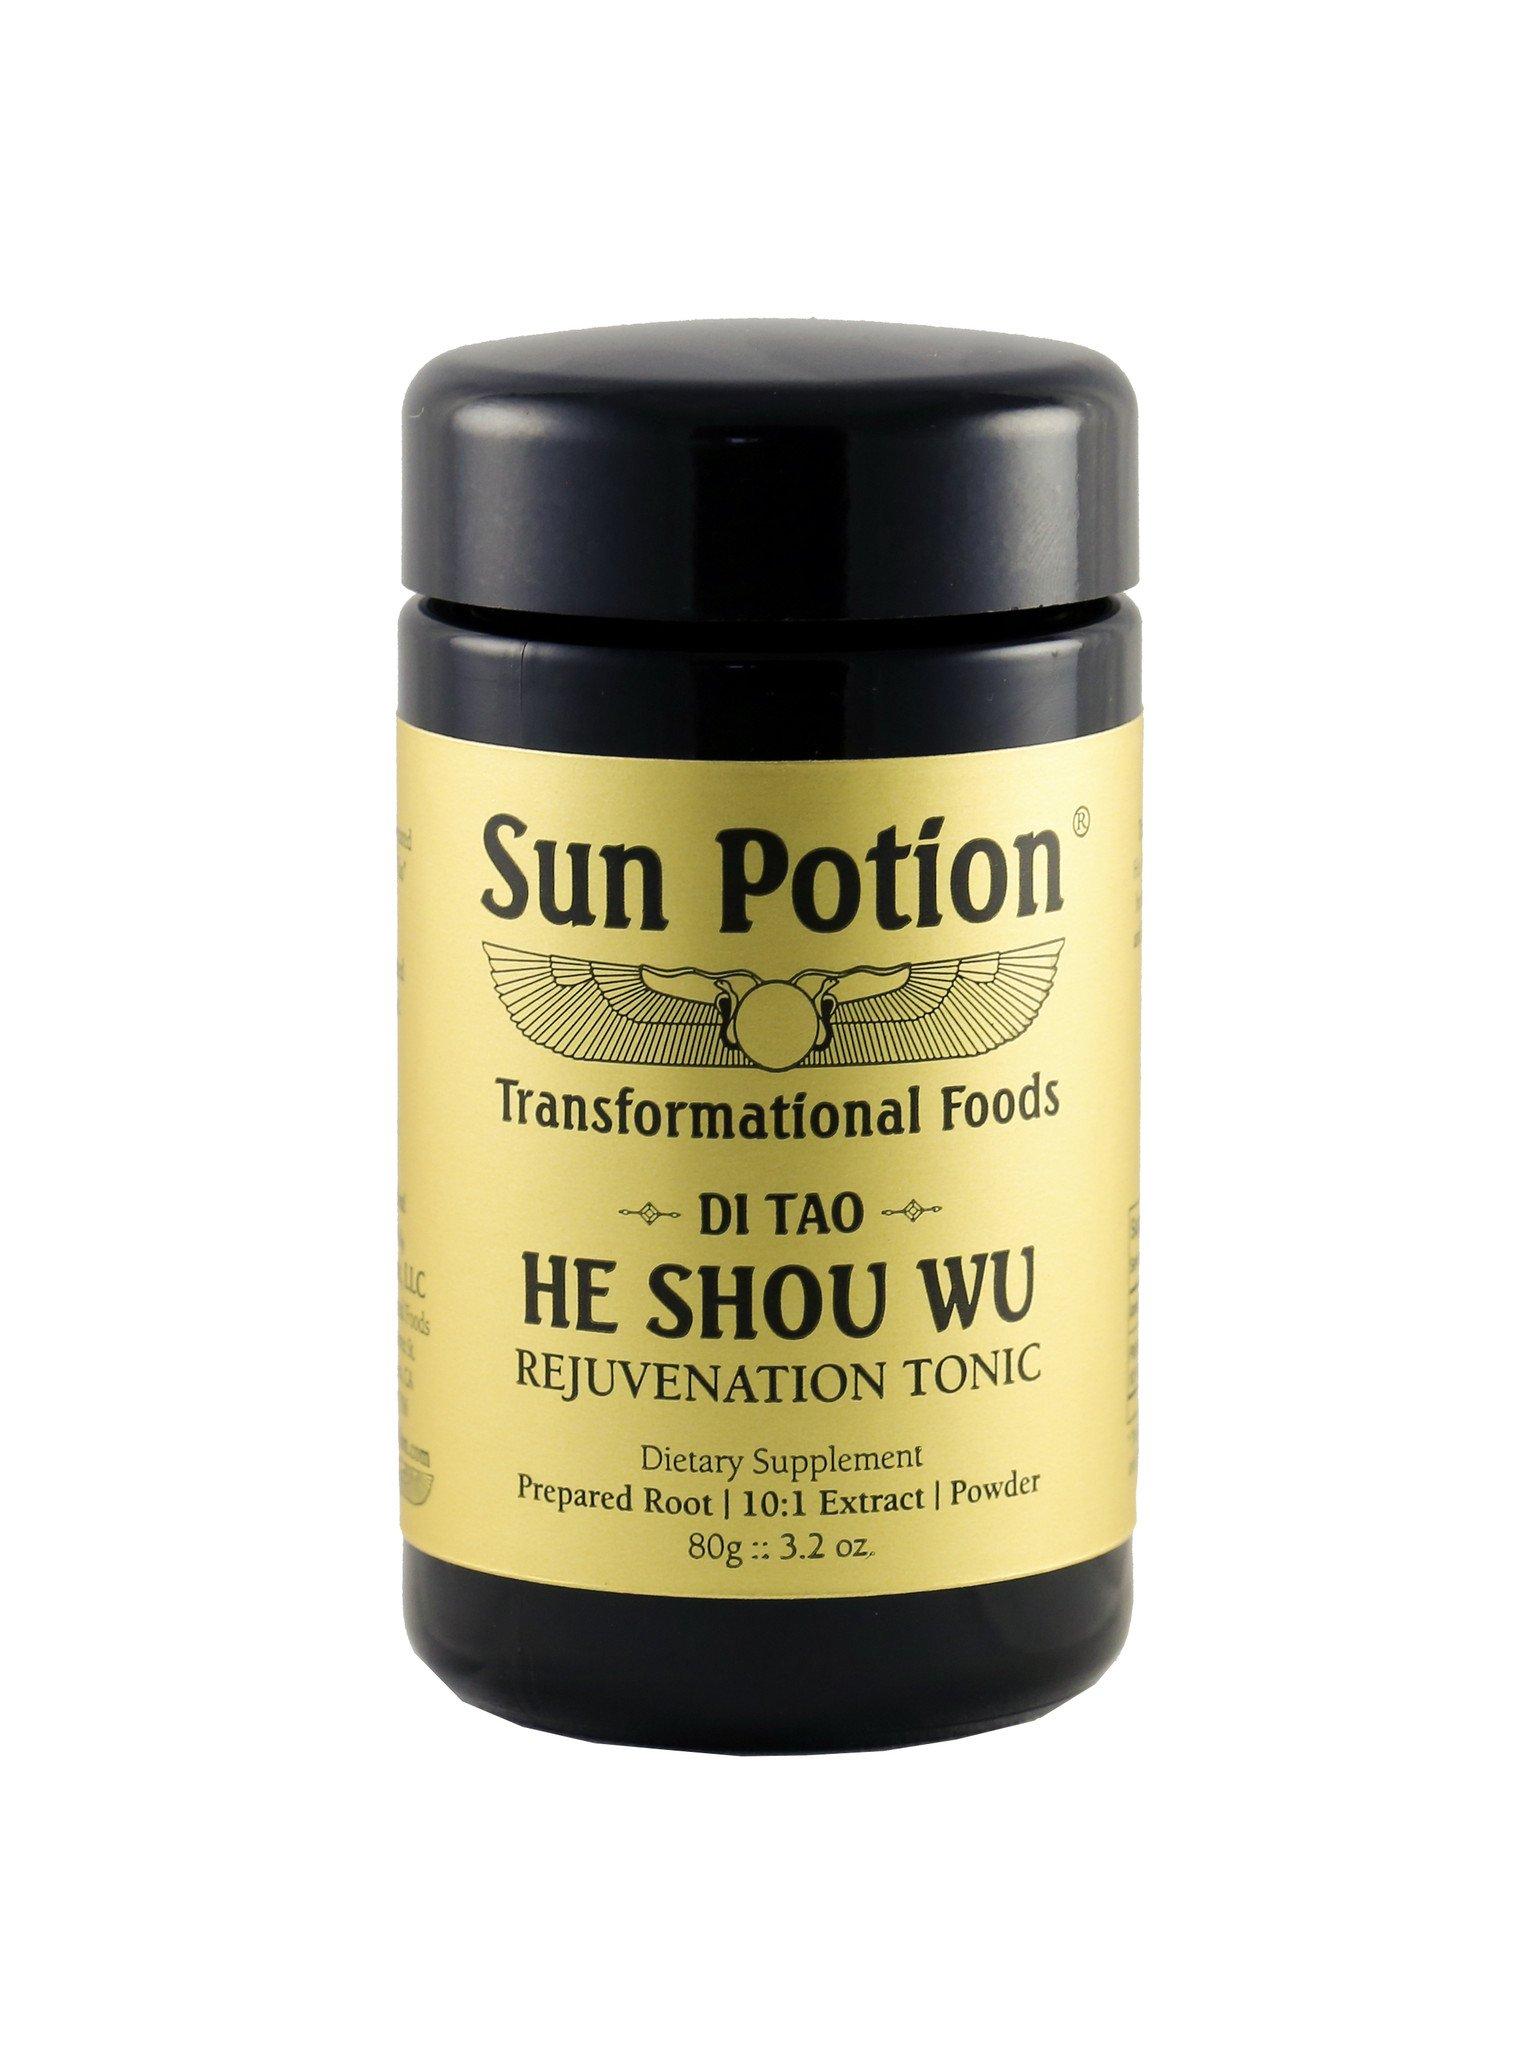 He Shou Wu (Wildcrafted) - 80g Jar   $55.00            Traditional Taoist Herb & Jing Tonic    Superior Blood and Longevity Tonic   He Shou Wu has a history of use as a longevity, anti-aging, blood-building, beauty, & rejuvenation food.